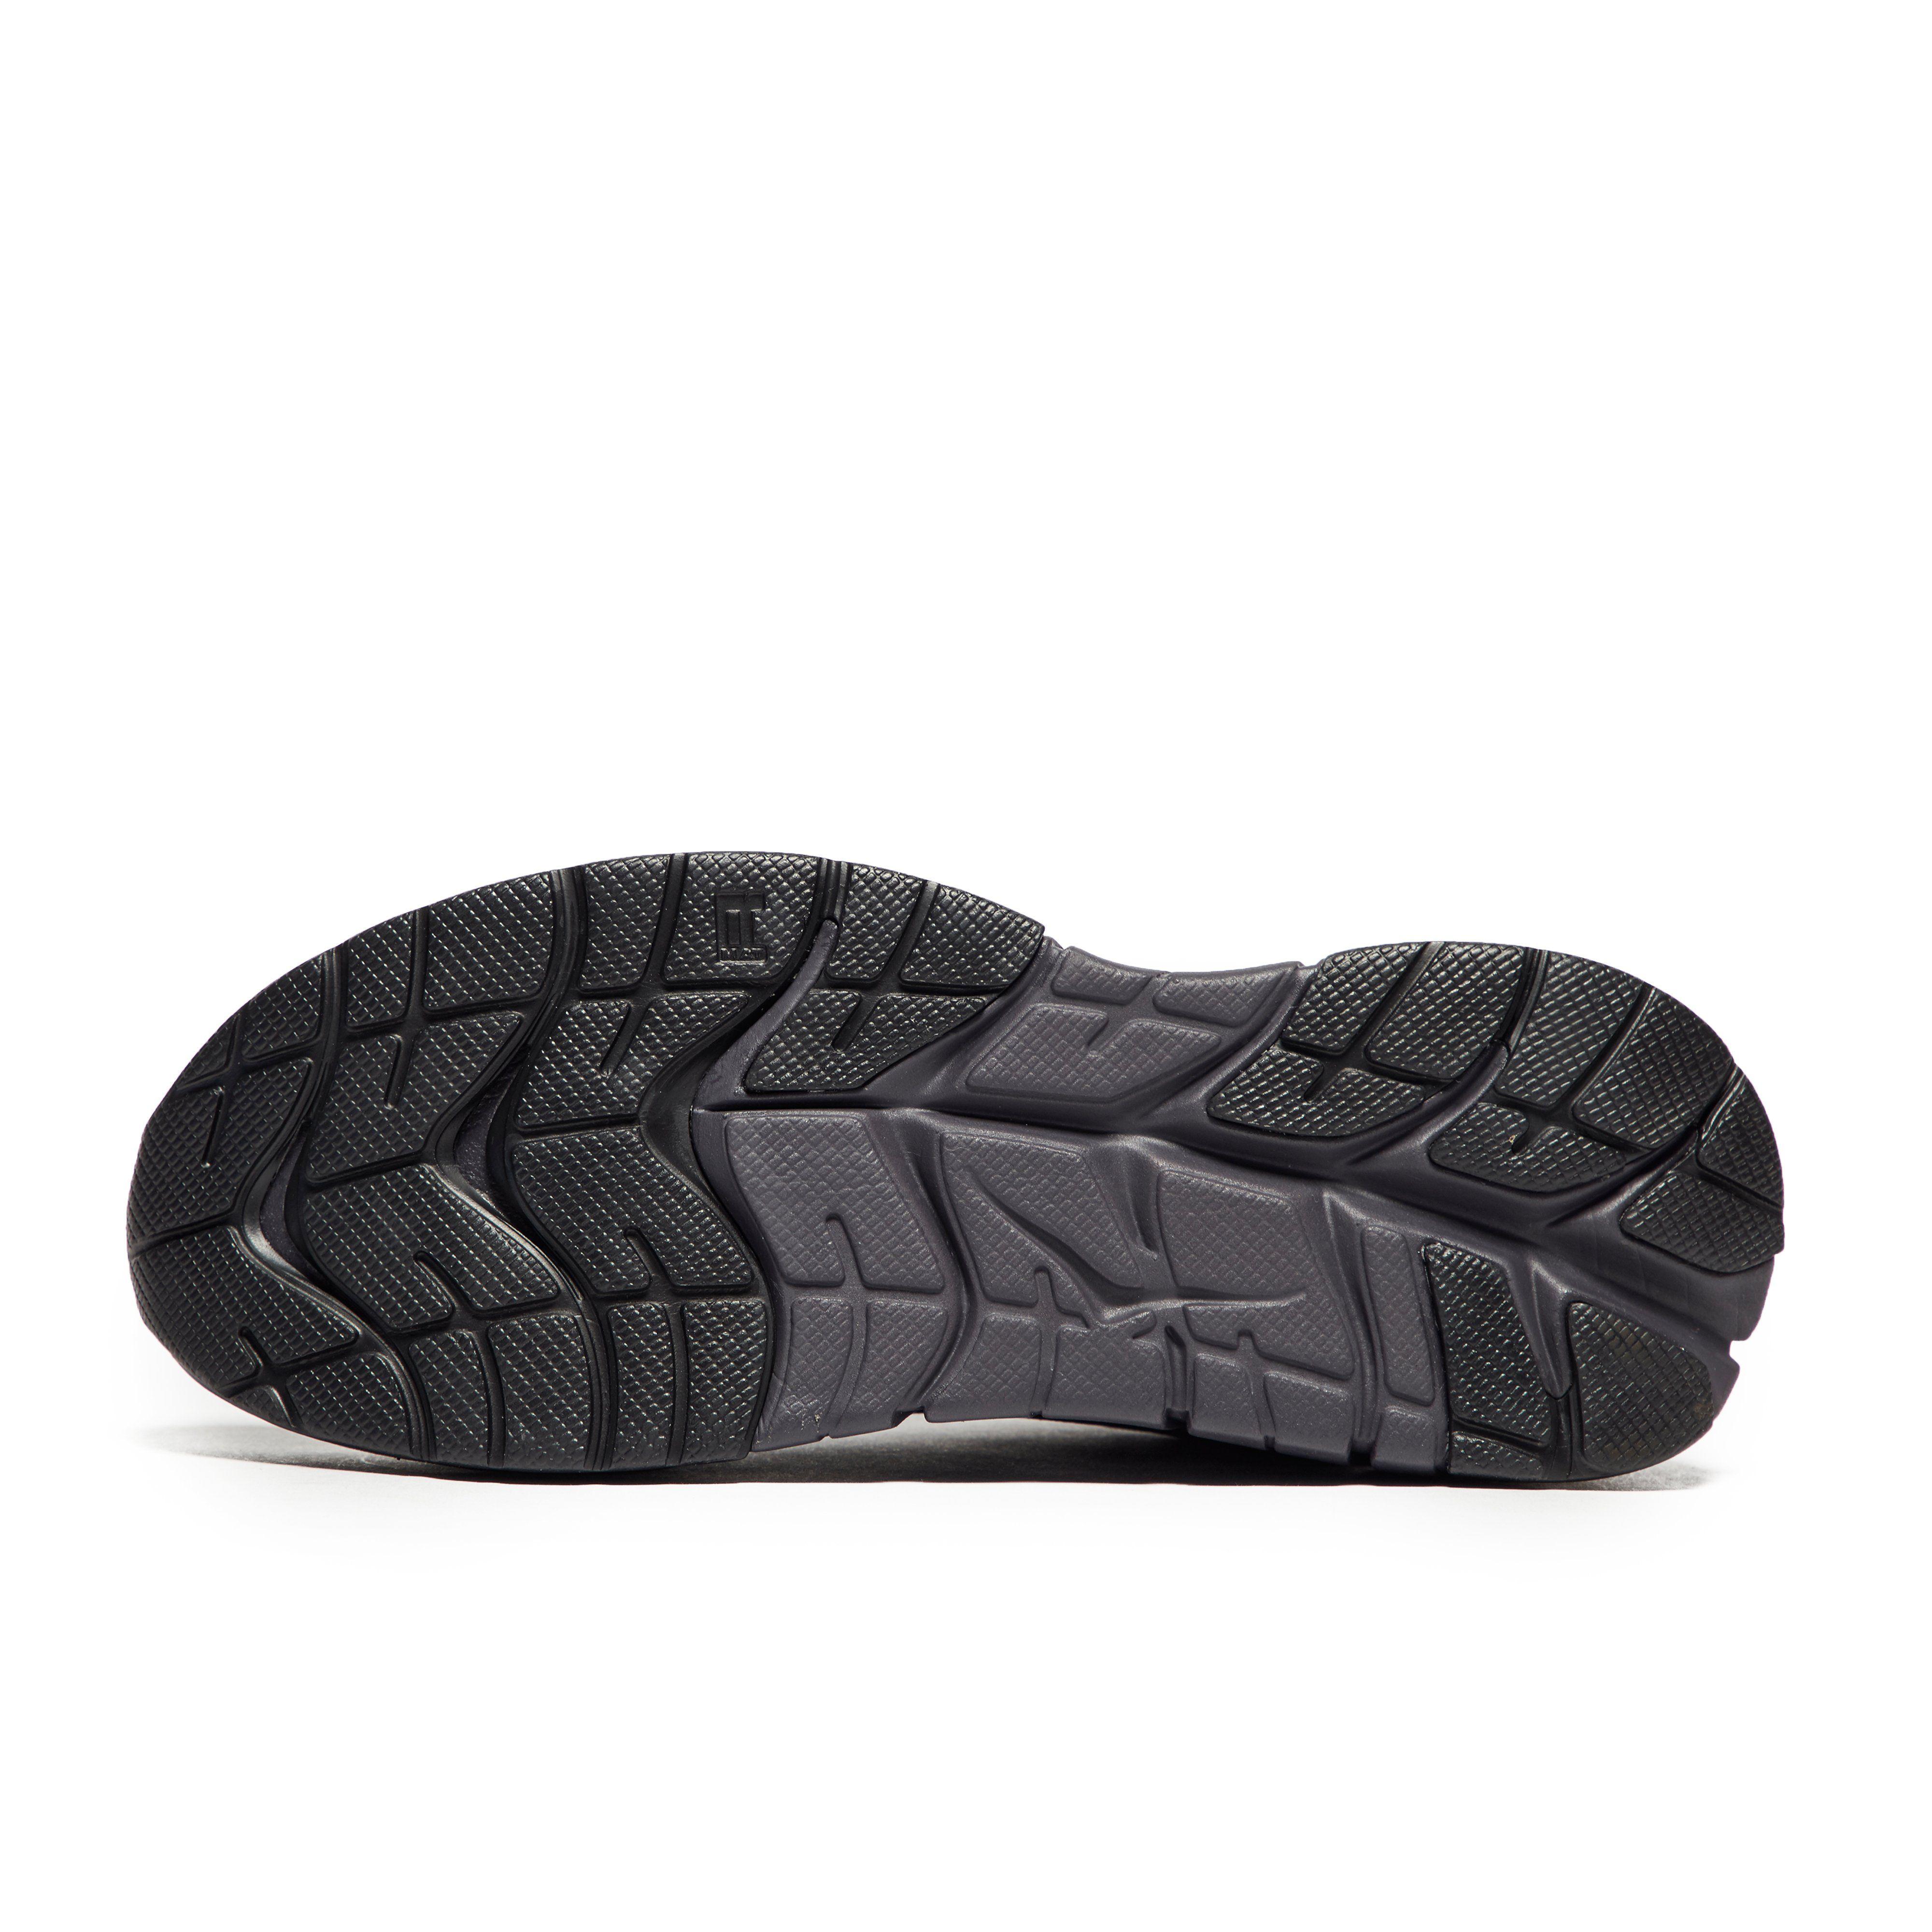 Hoka One One Cavu Fly At Night Men's Running Shoes